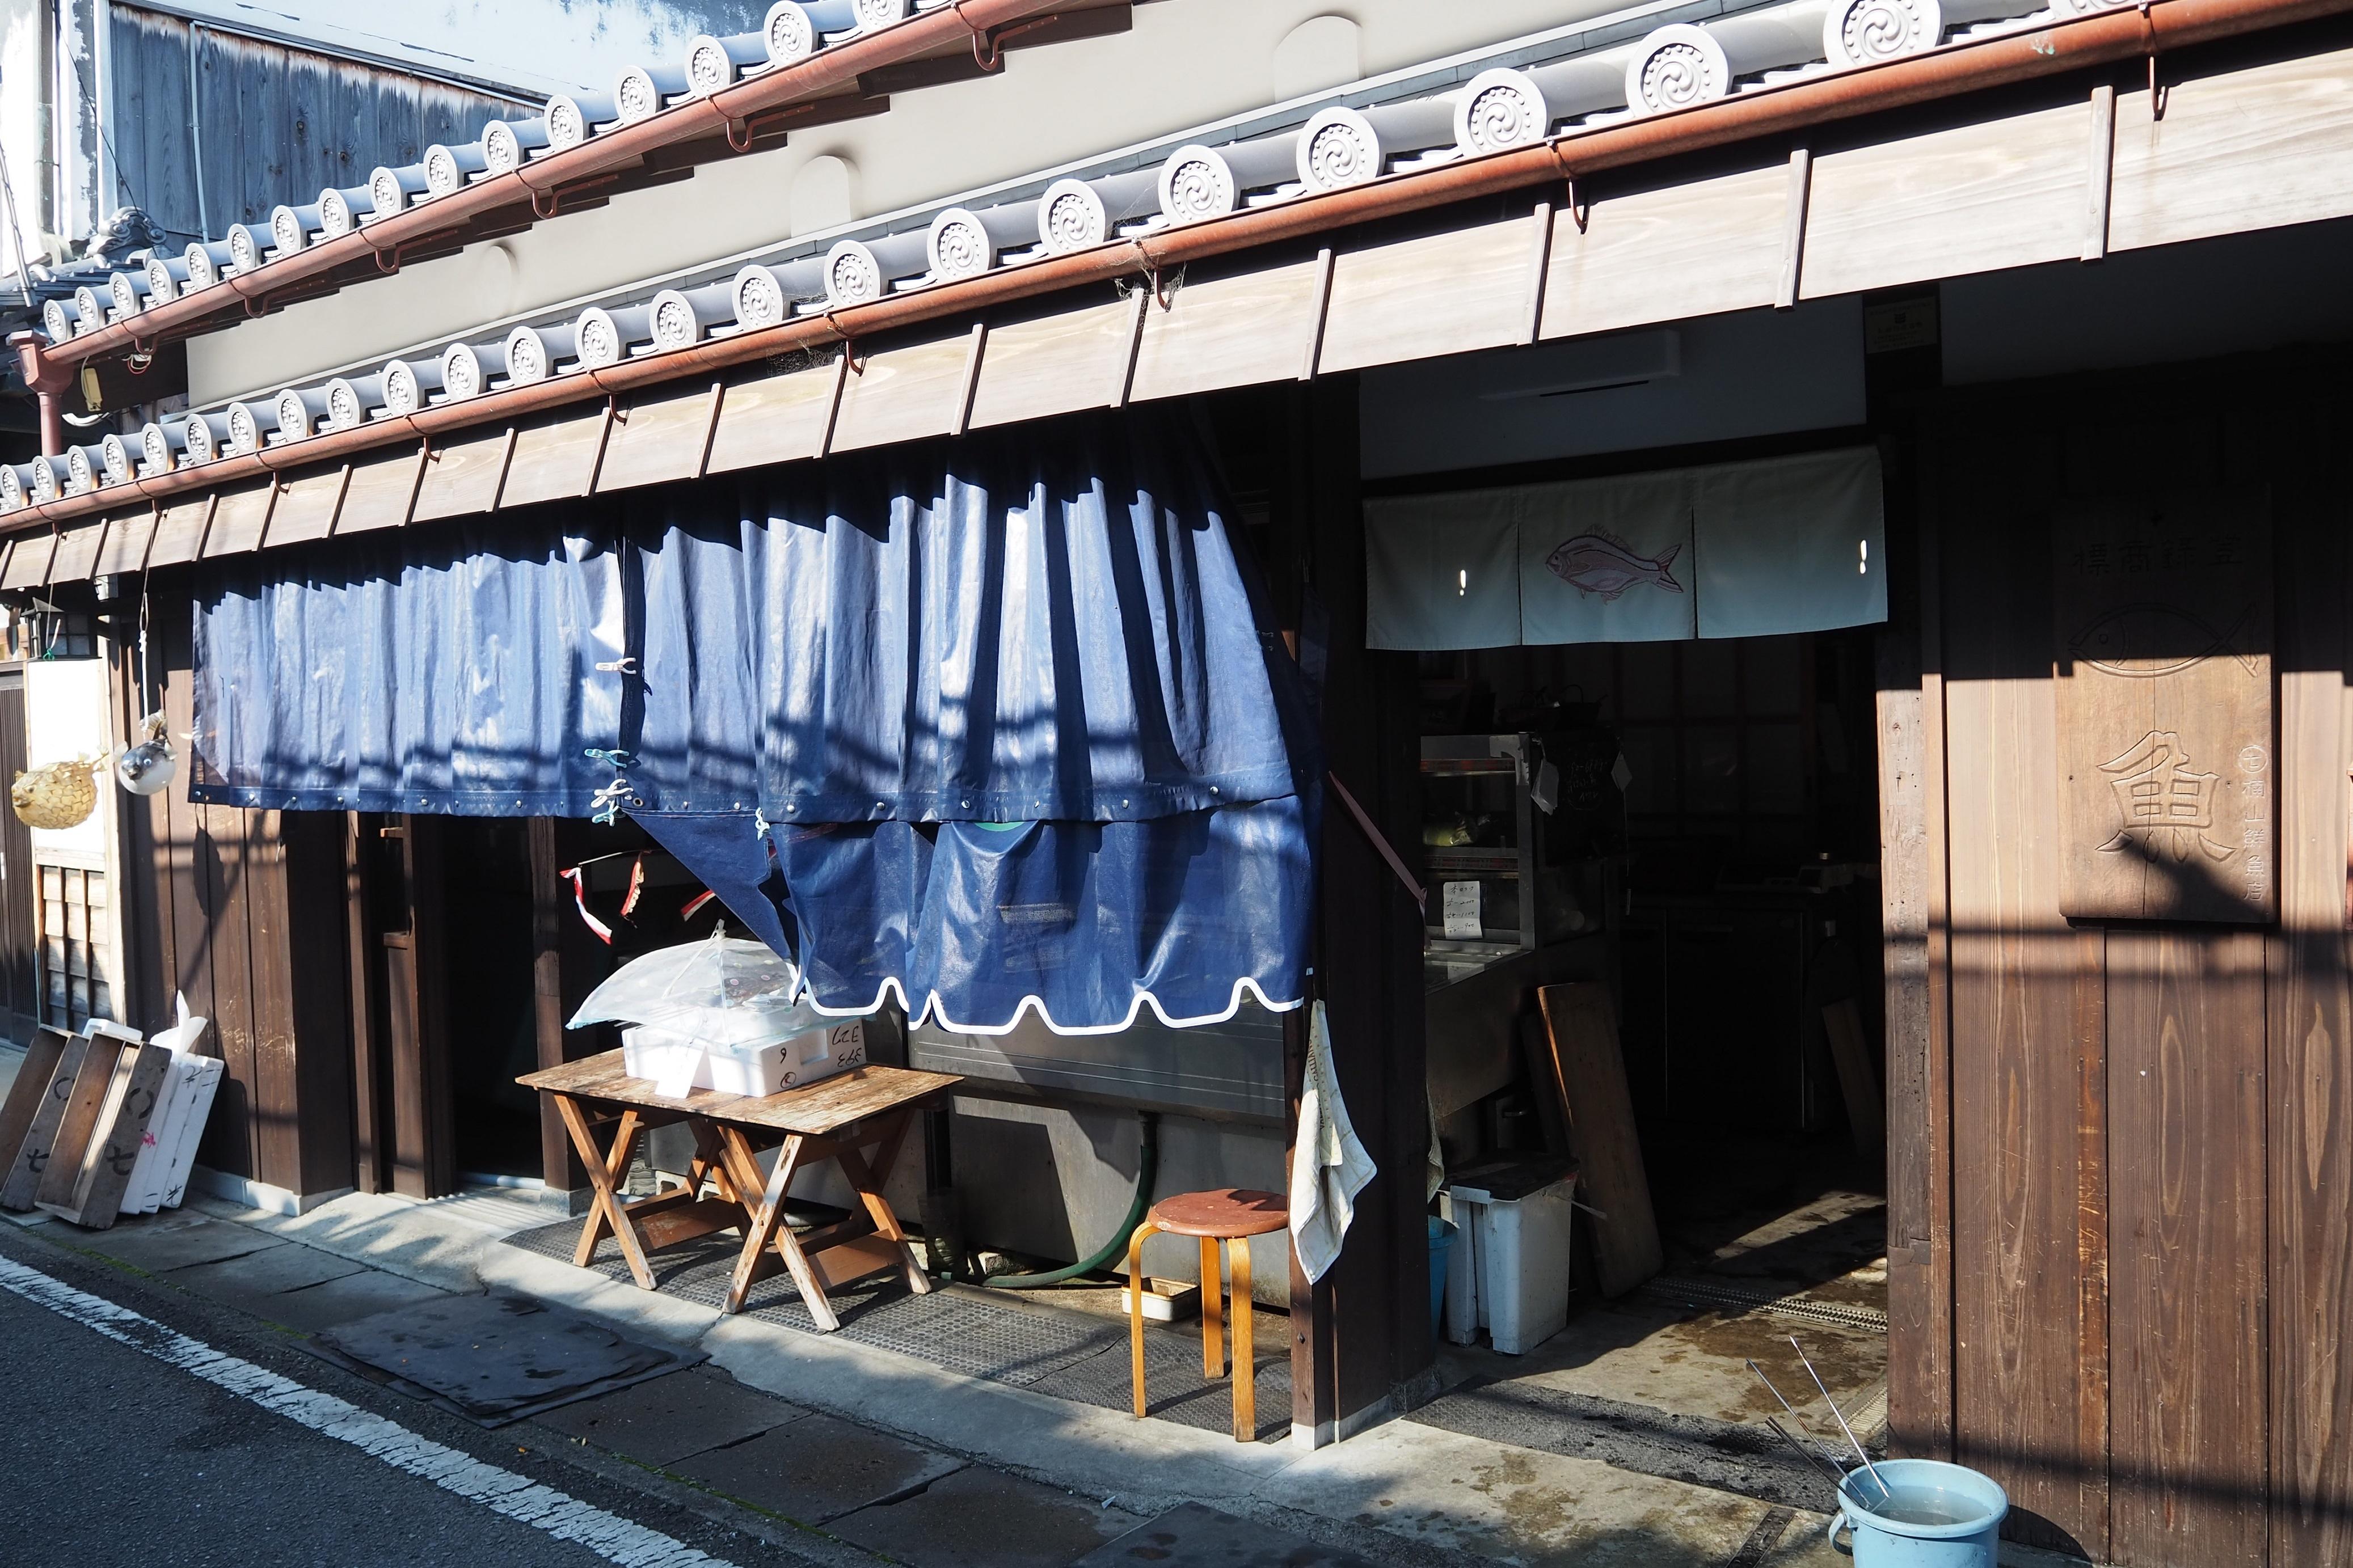 harleydavidson-motorcycle-touring-blog-wakayama-yuasatown-fishmonger.jpg